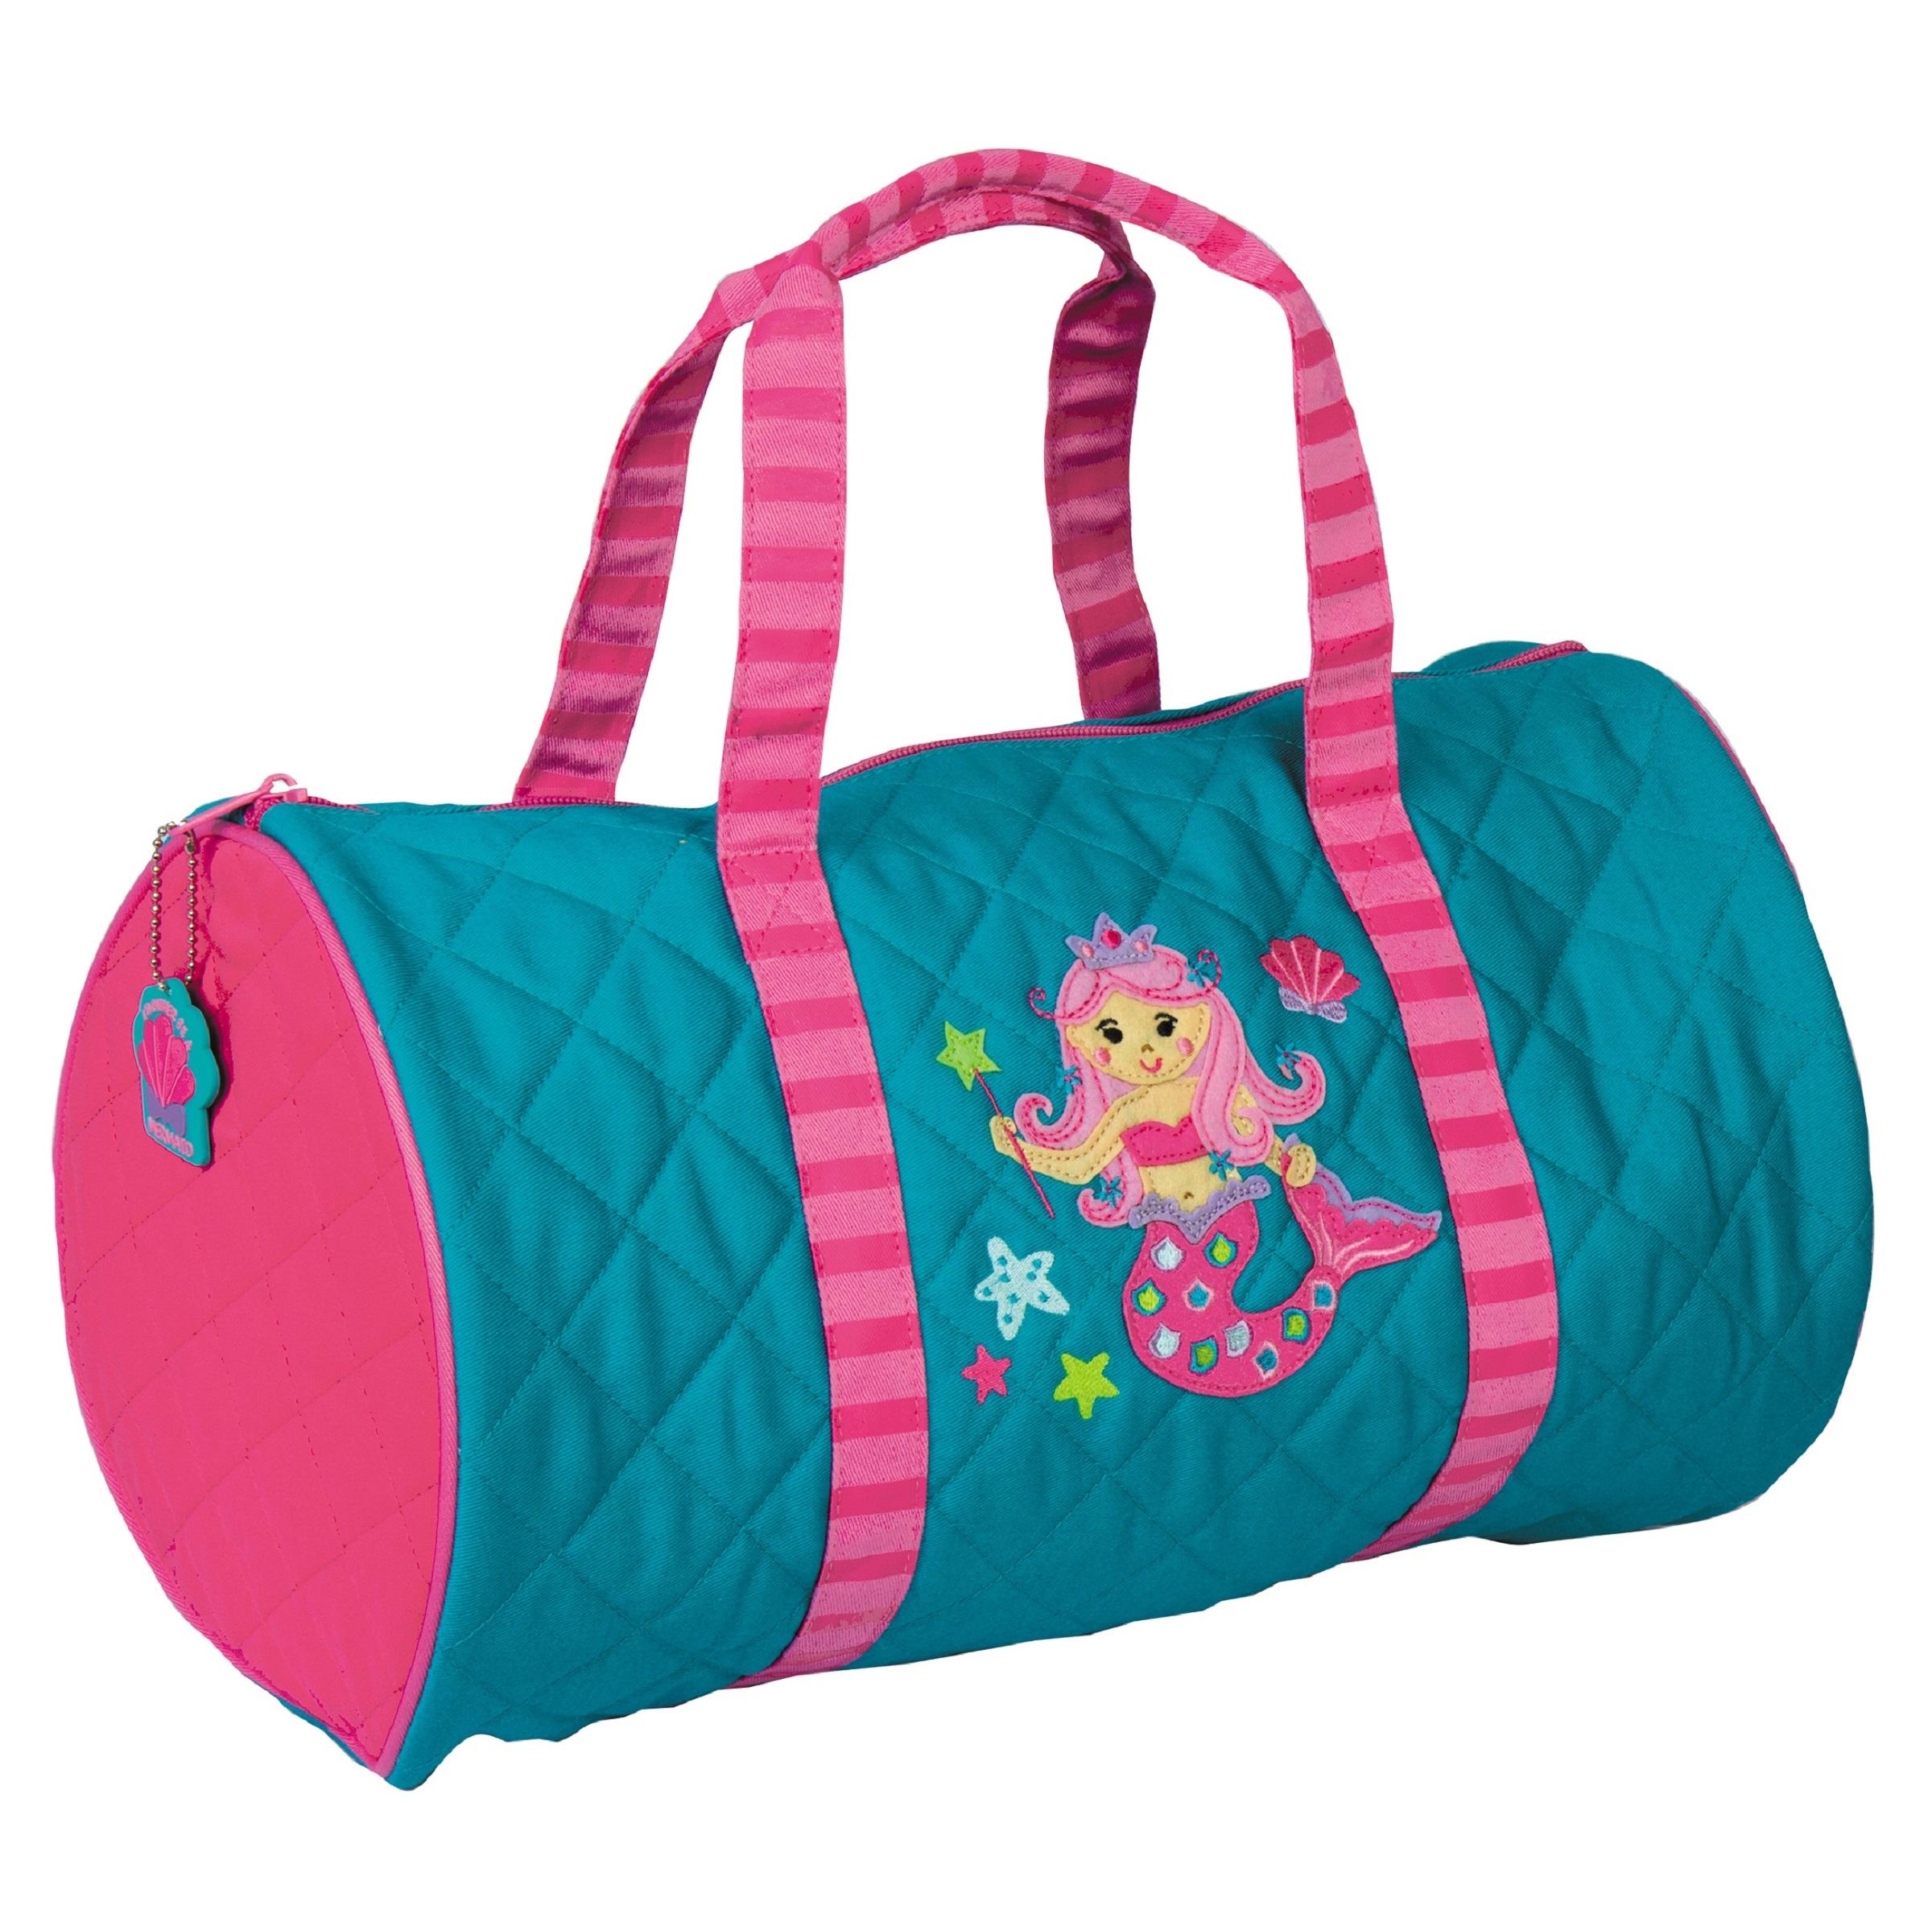 30e6f7de08ce Little Girls Mermaid Duffle Bag-Lavington Designs